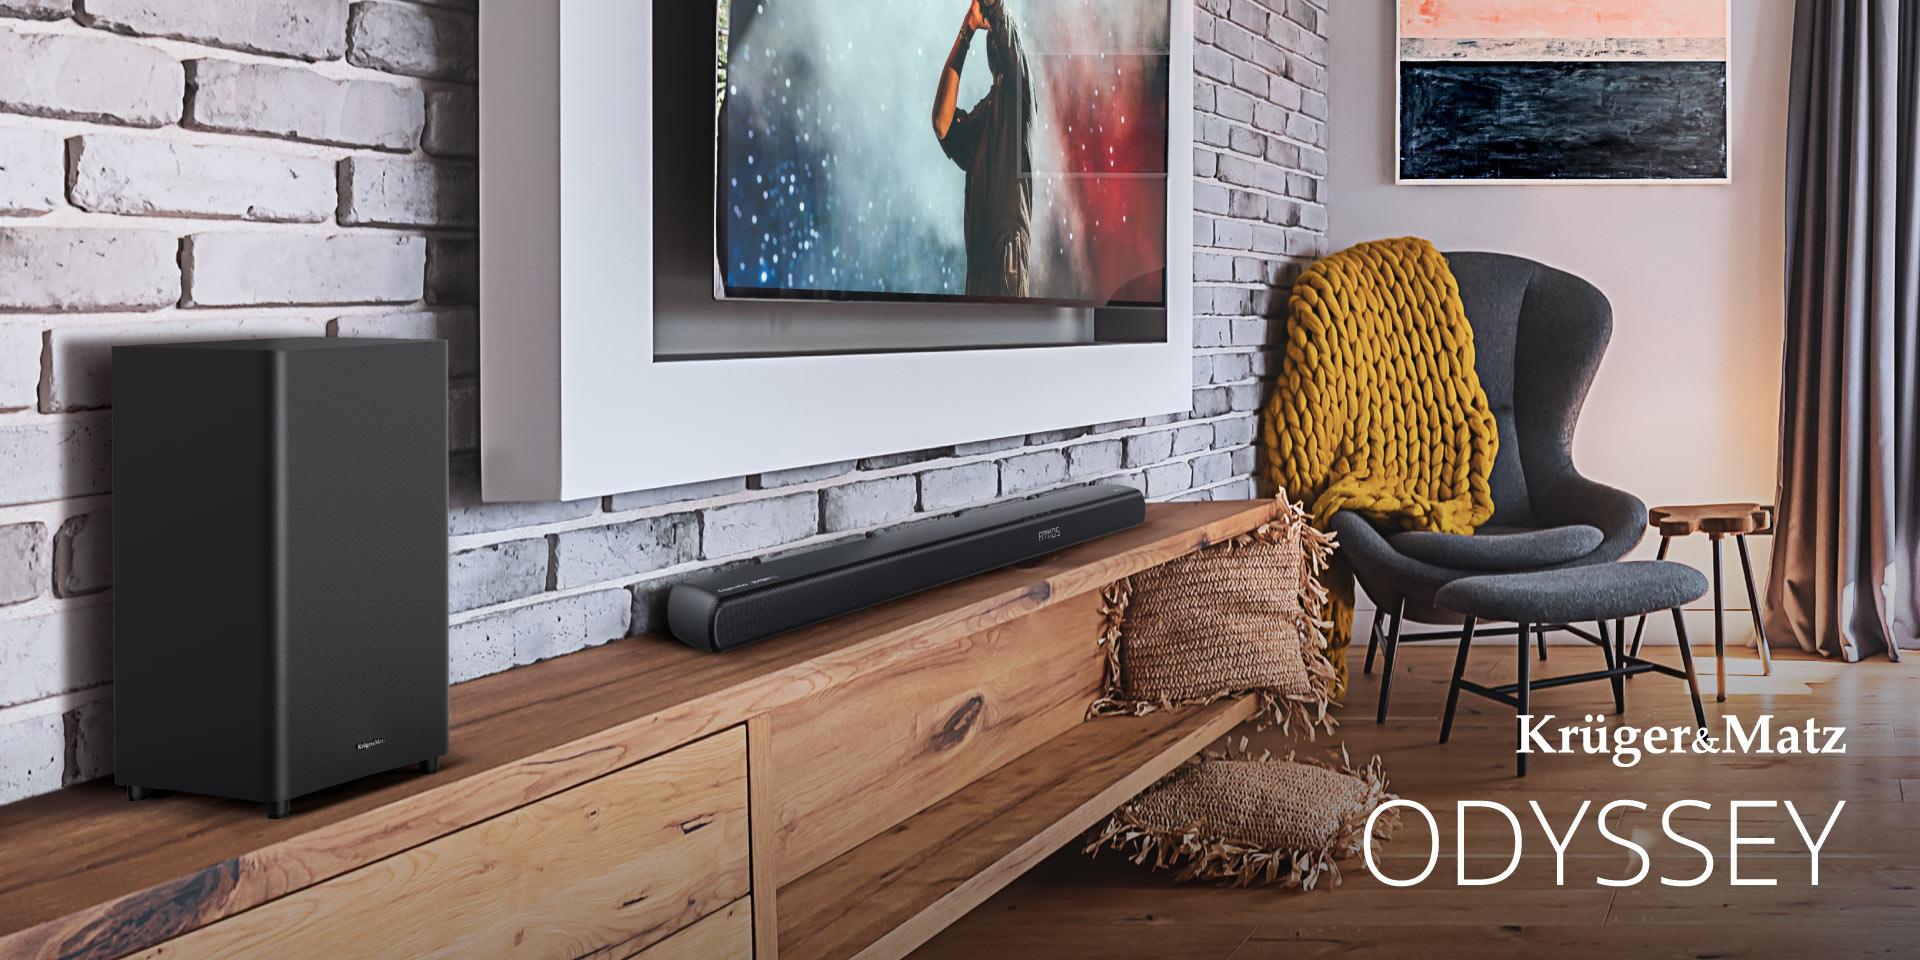 Soundbar Kruger&Matz Odyssey 3.1